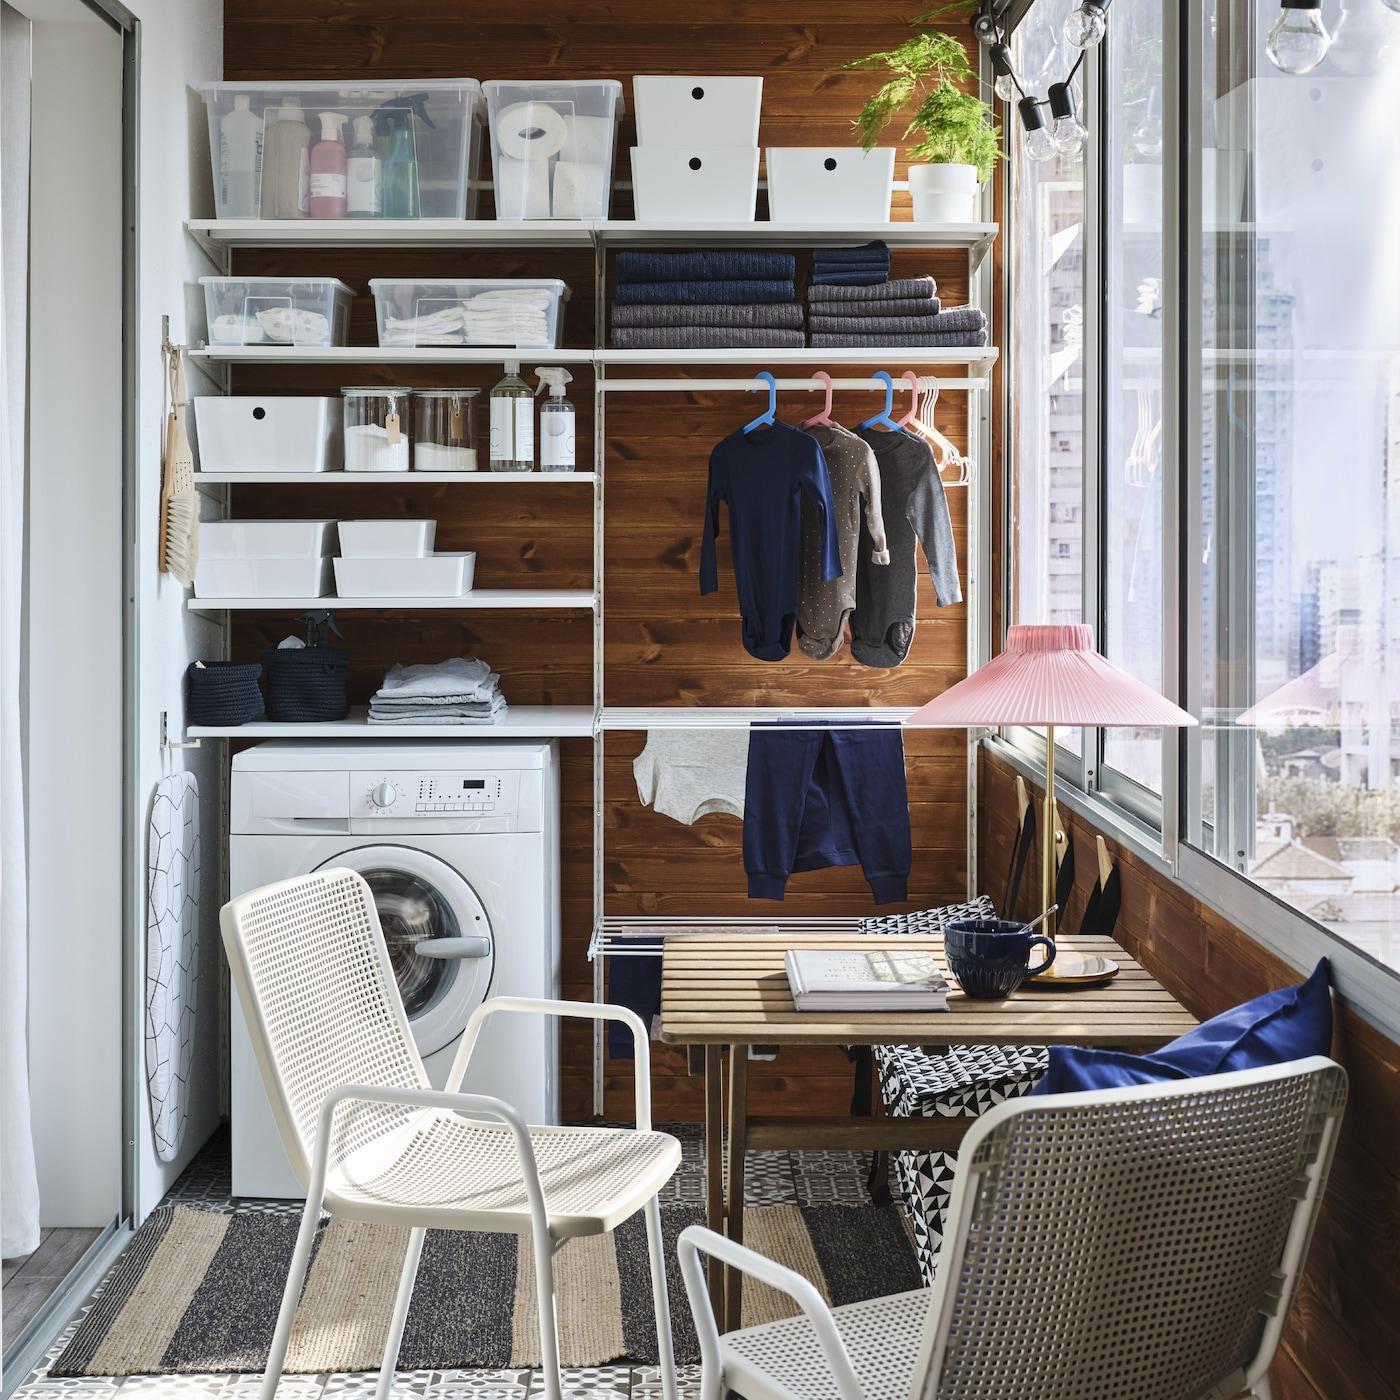 Arredare Il Balcone Ikea outdoor gallery - ikea switzerland